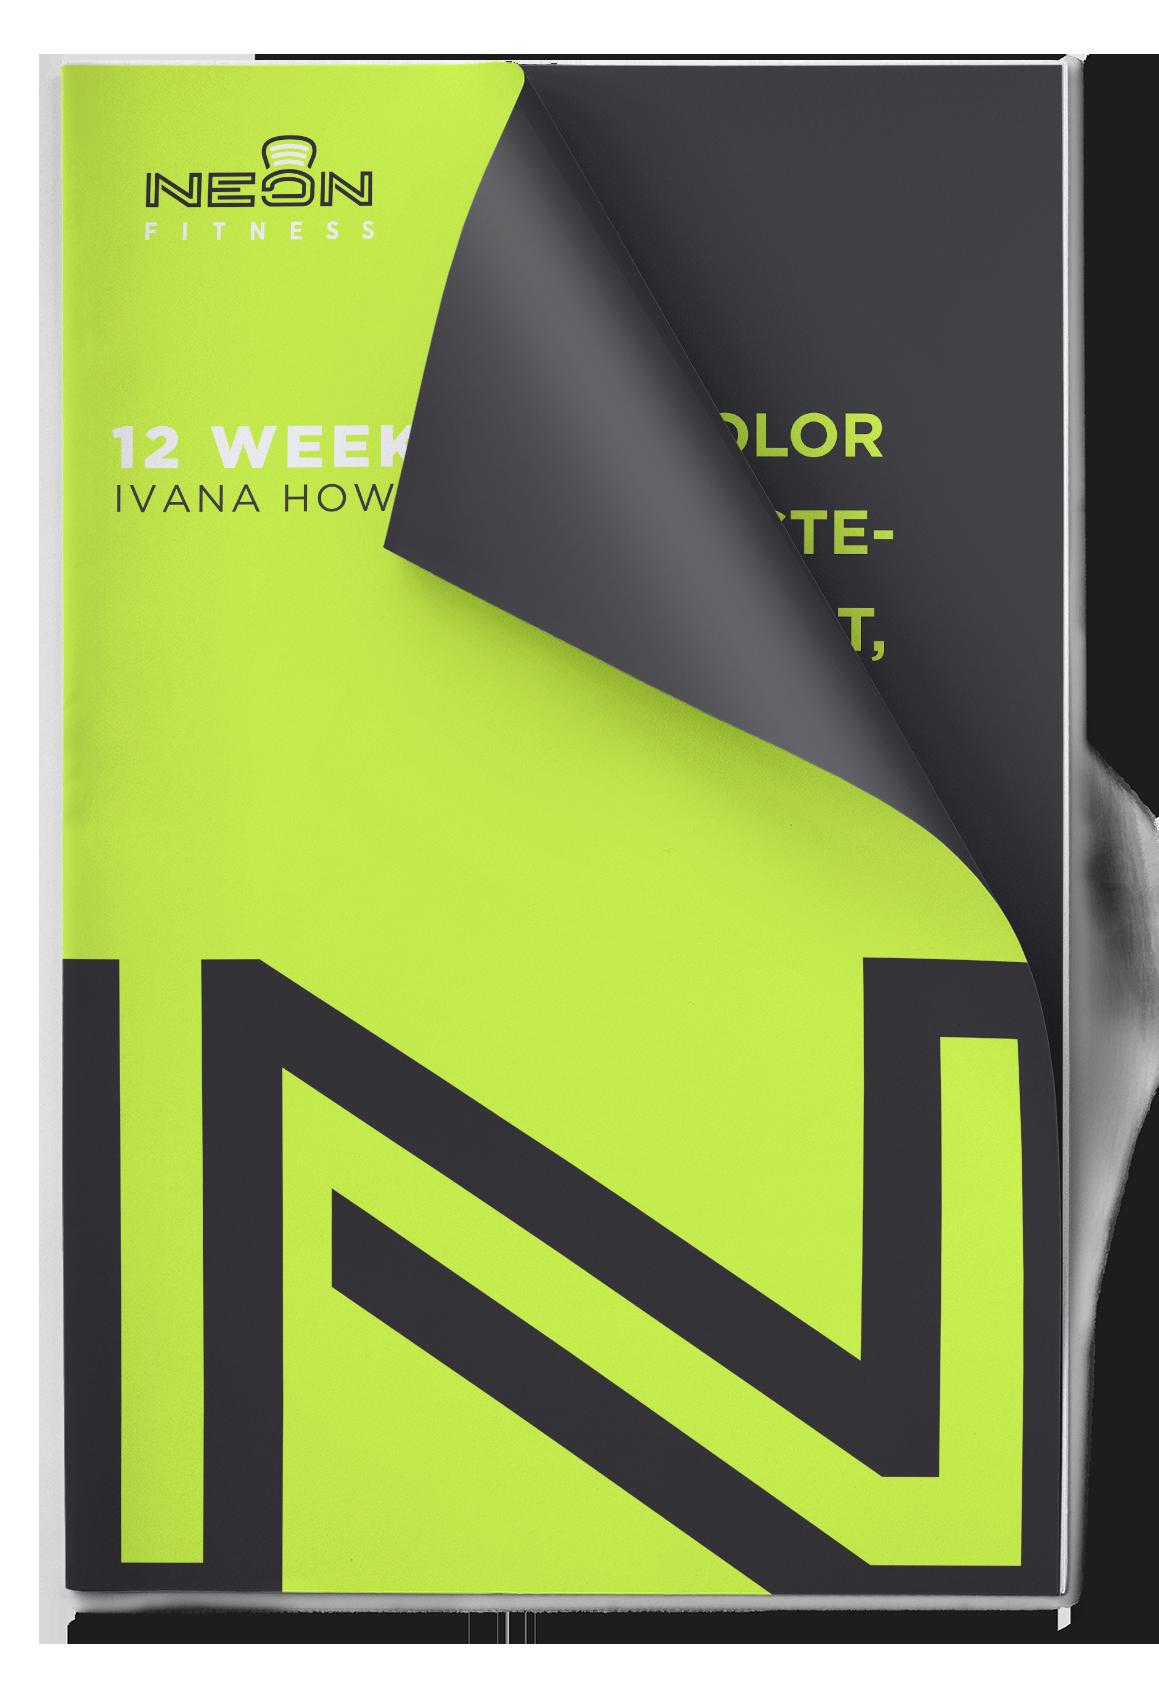 Neon Fitness Training Program Layout